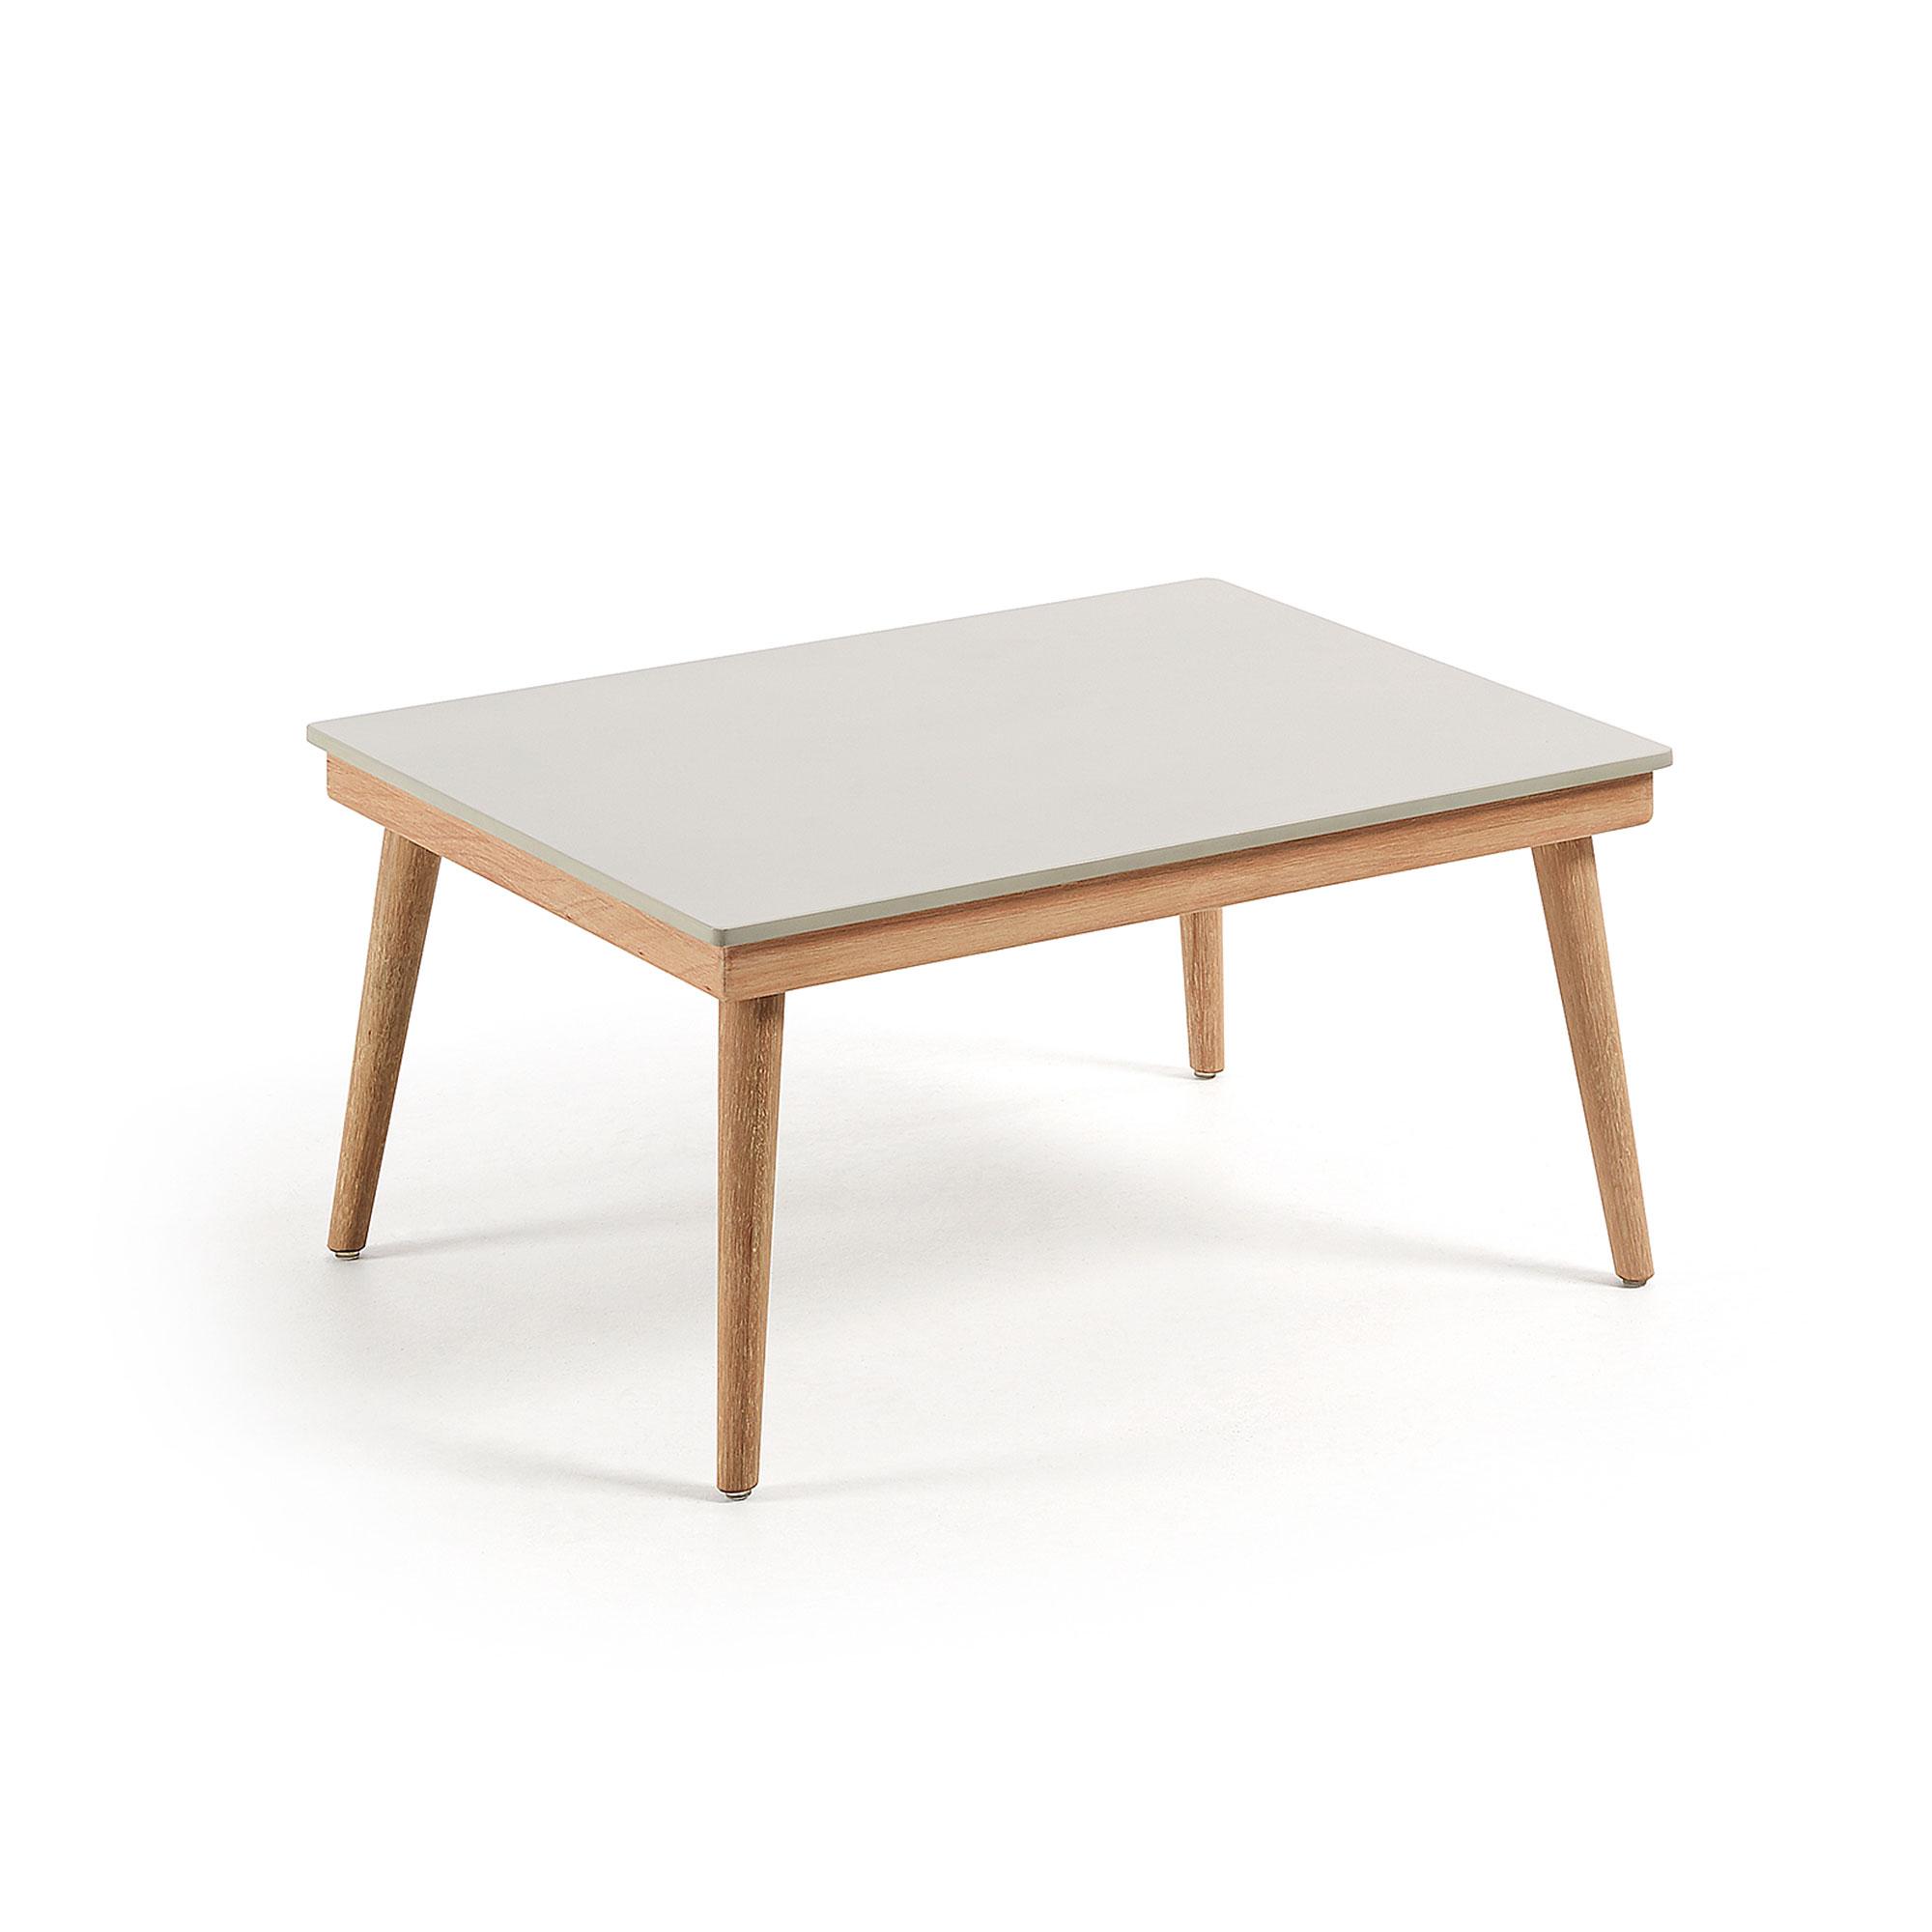 laforma Laforma ramdom sofabord - lysegrå/natur polycement/eukalyptustræ, rektangulær (80x60) på boboonline.dk